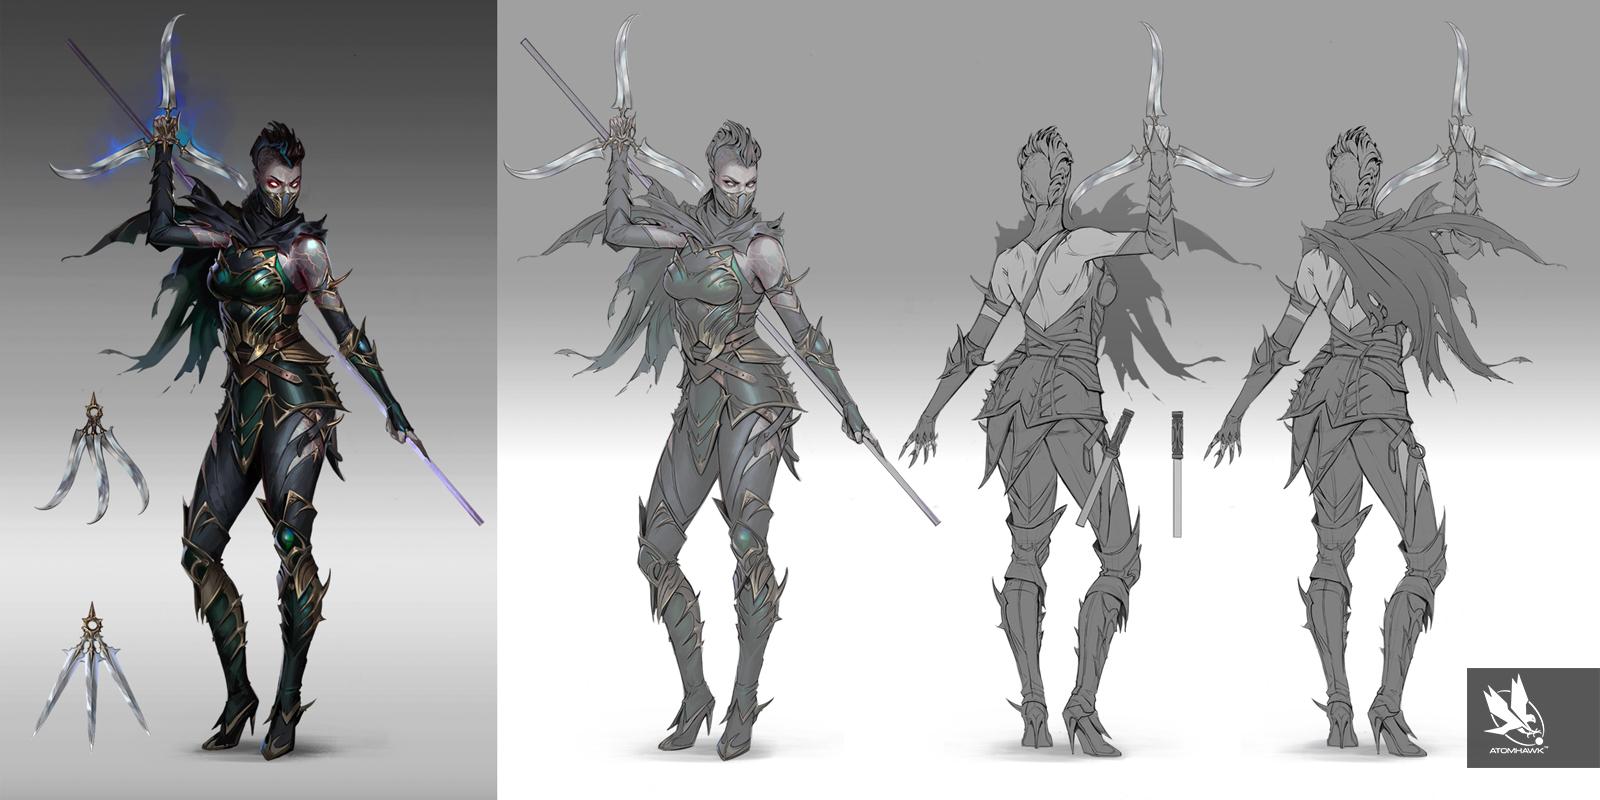 Atomhawk_Warner-Bros-NetherRealm_Mortal-Kombat-11_Concept-Art_Character-Design_Jade_Revenant_1.jpg